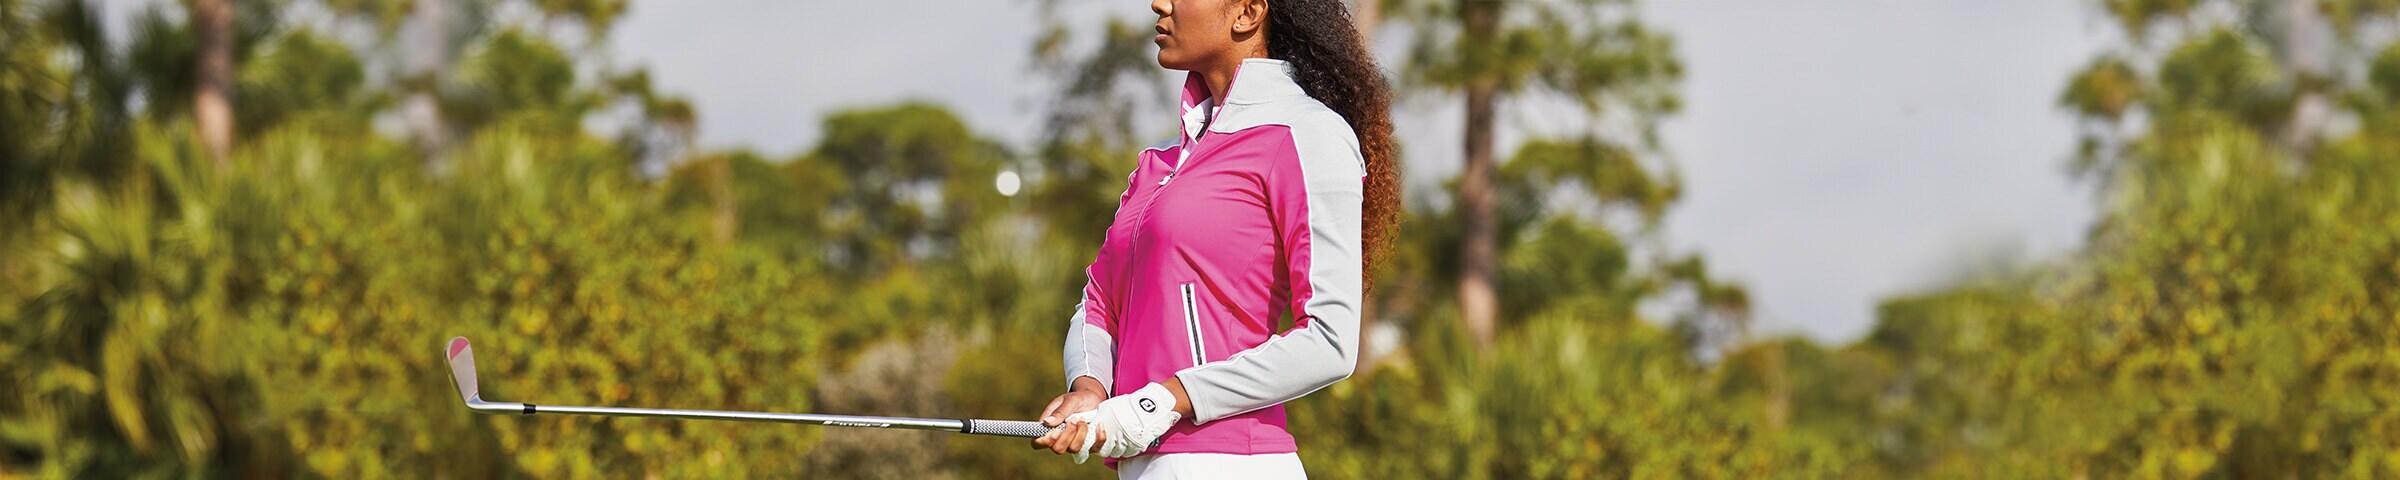 FootJoy Women's Golf Apparel - Base & Mid-Layers